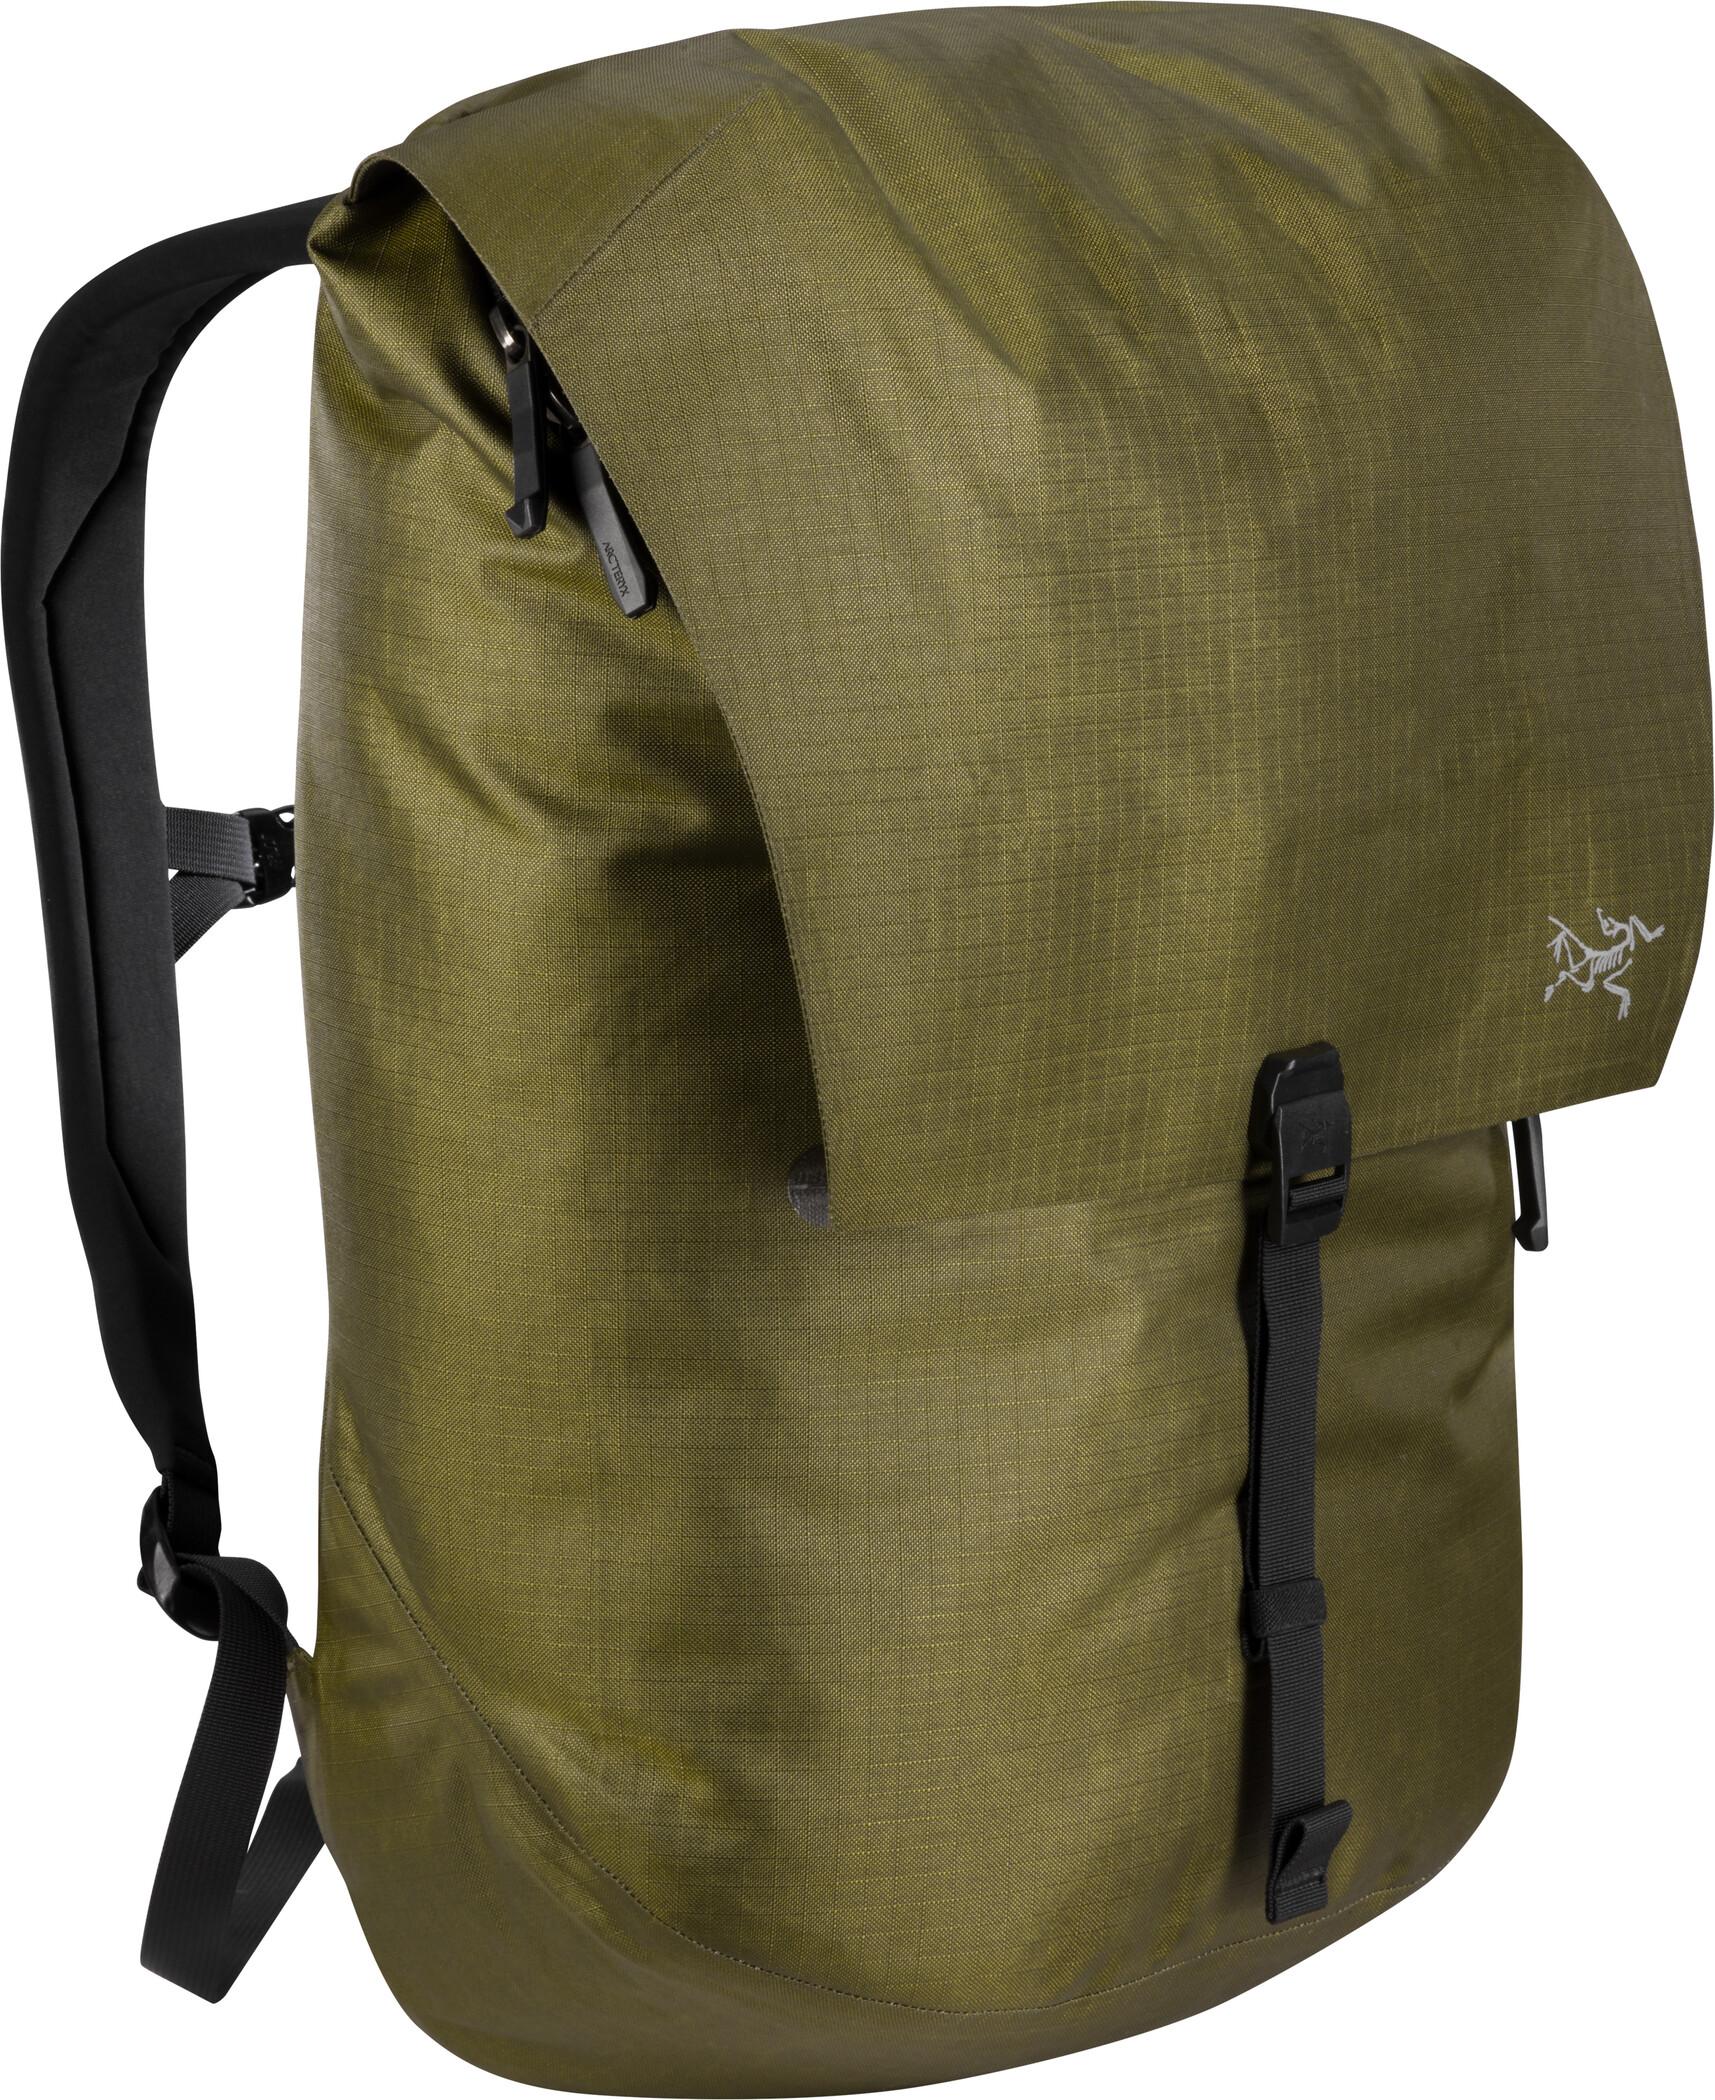 Arc'teryx Granville 20 Rygsæk, bushwhack (2019)   Travel bags